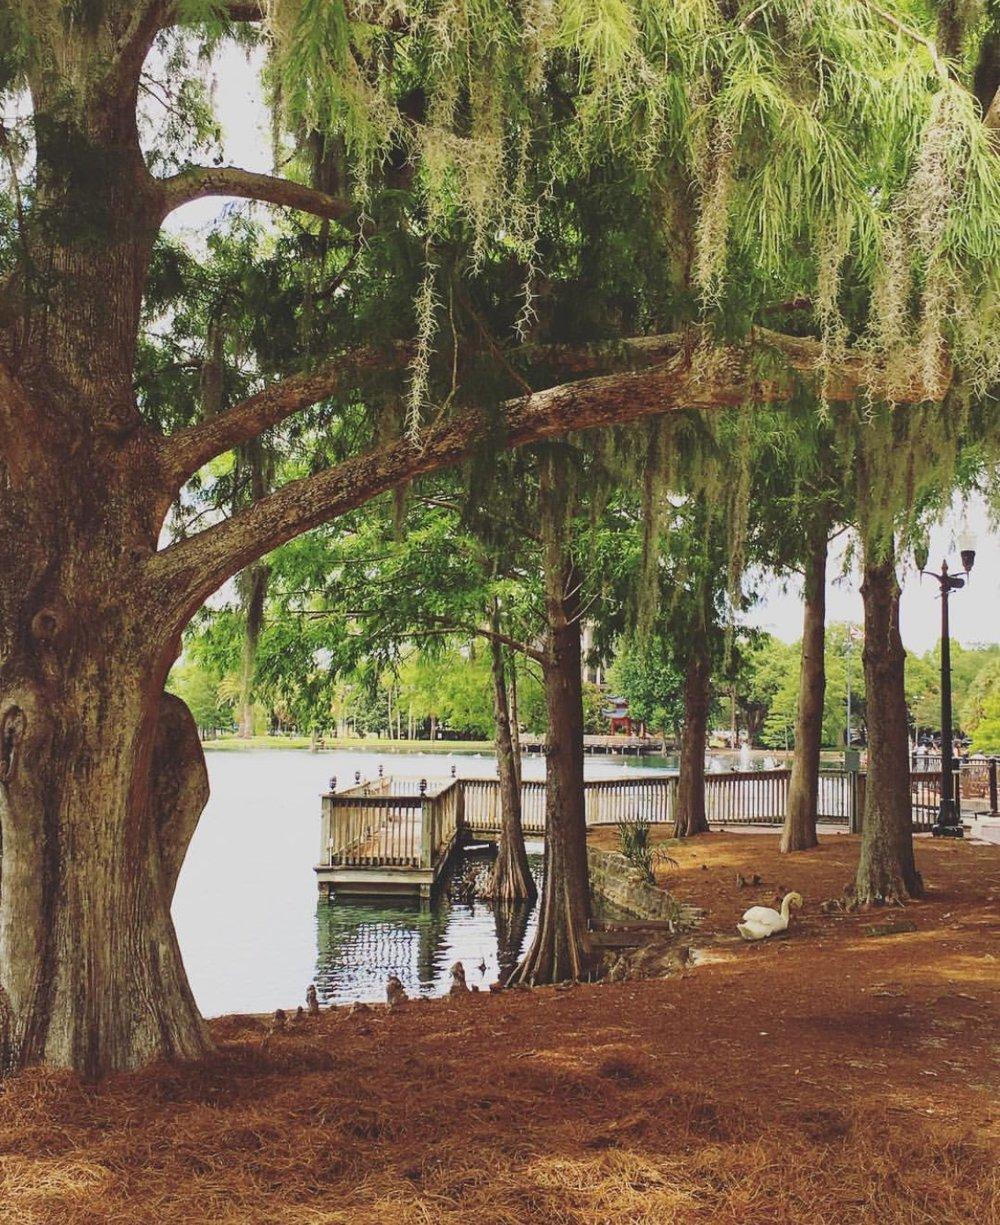 Parque natural Lake Eola em Downtown Orlando